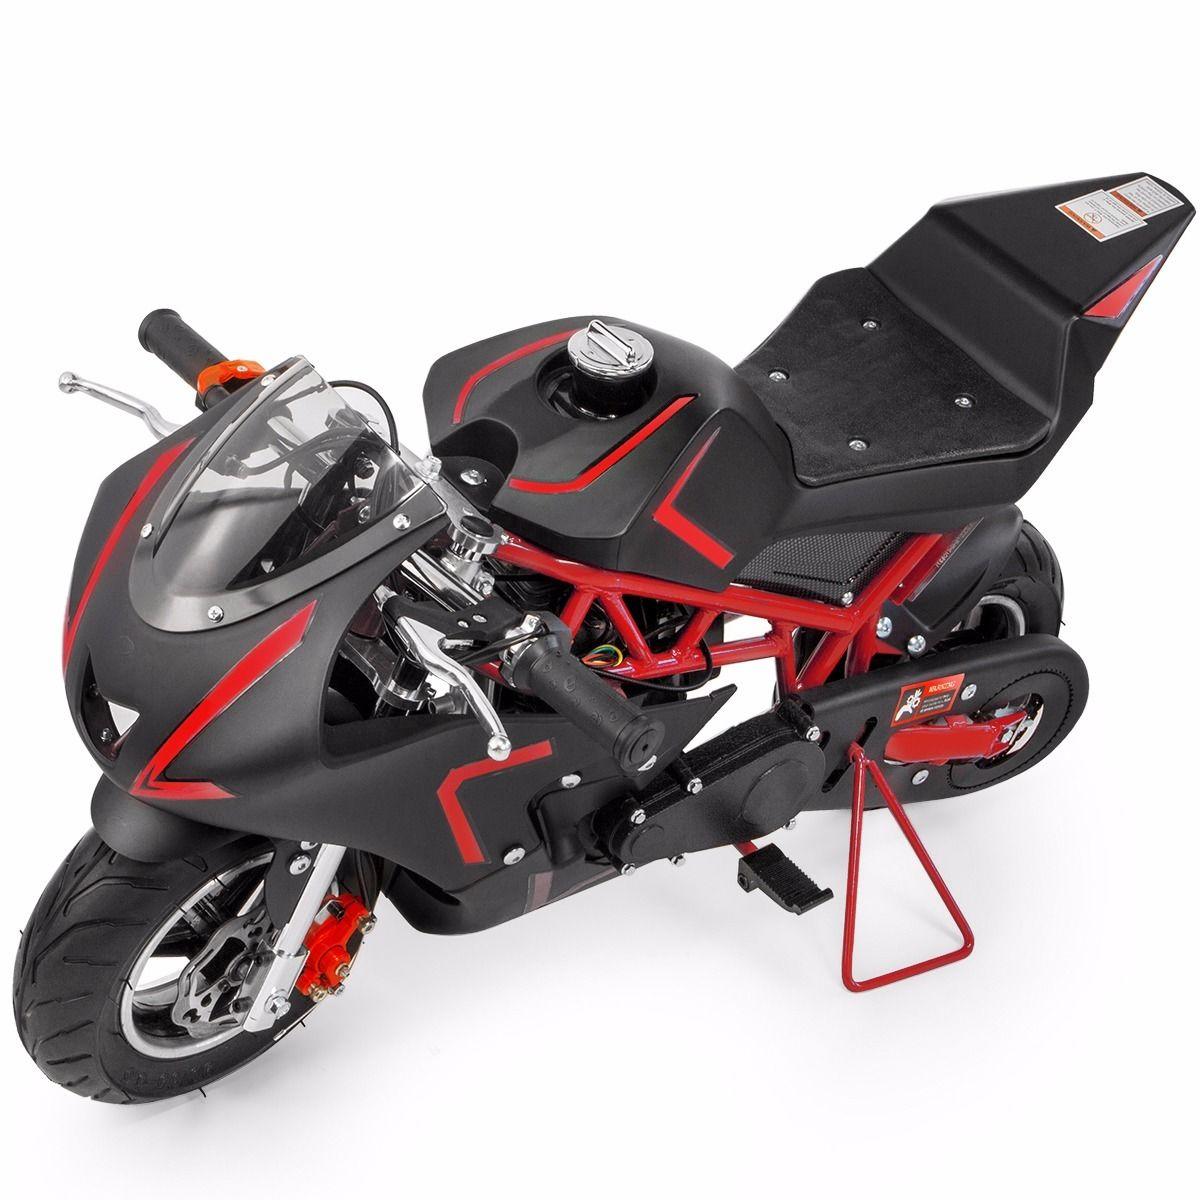 XtremepowerUS-Gas-Pocket-Bike-Motor-Bike-Scooter-40cc-Epa-Engine-Motorcycle thumbnail 26